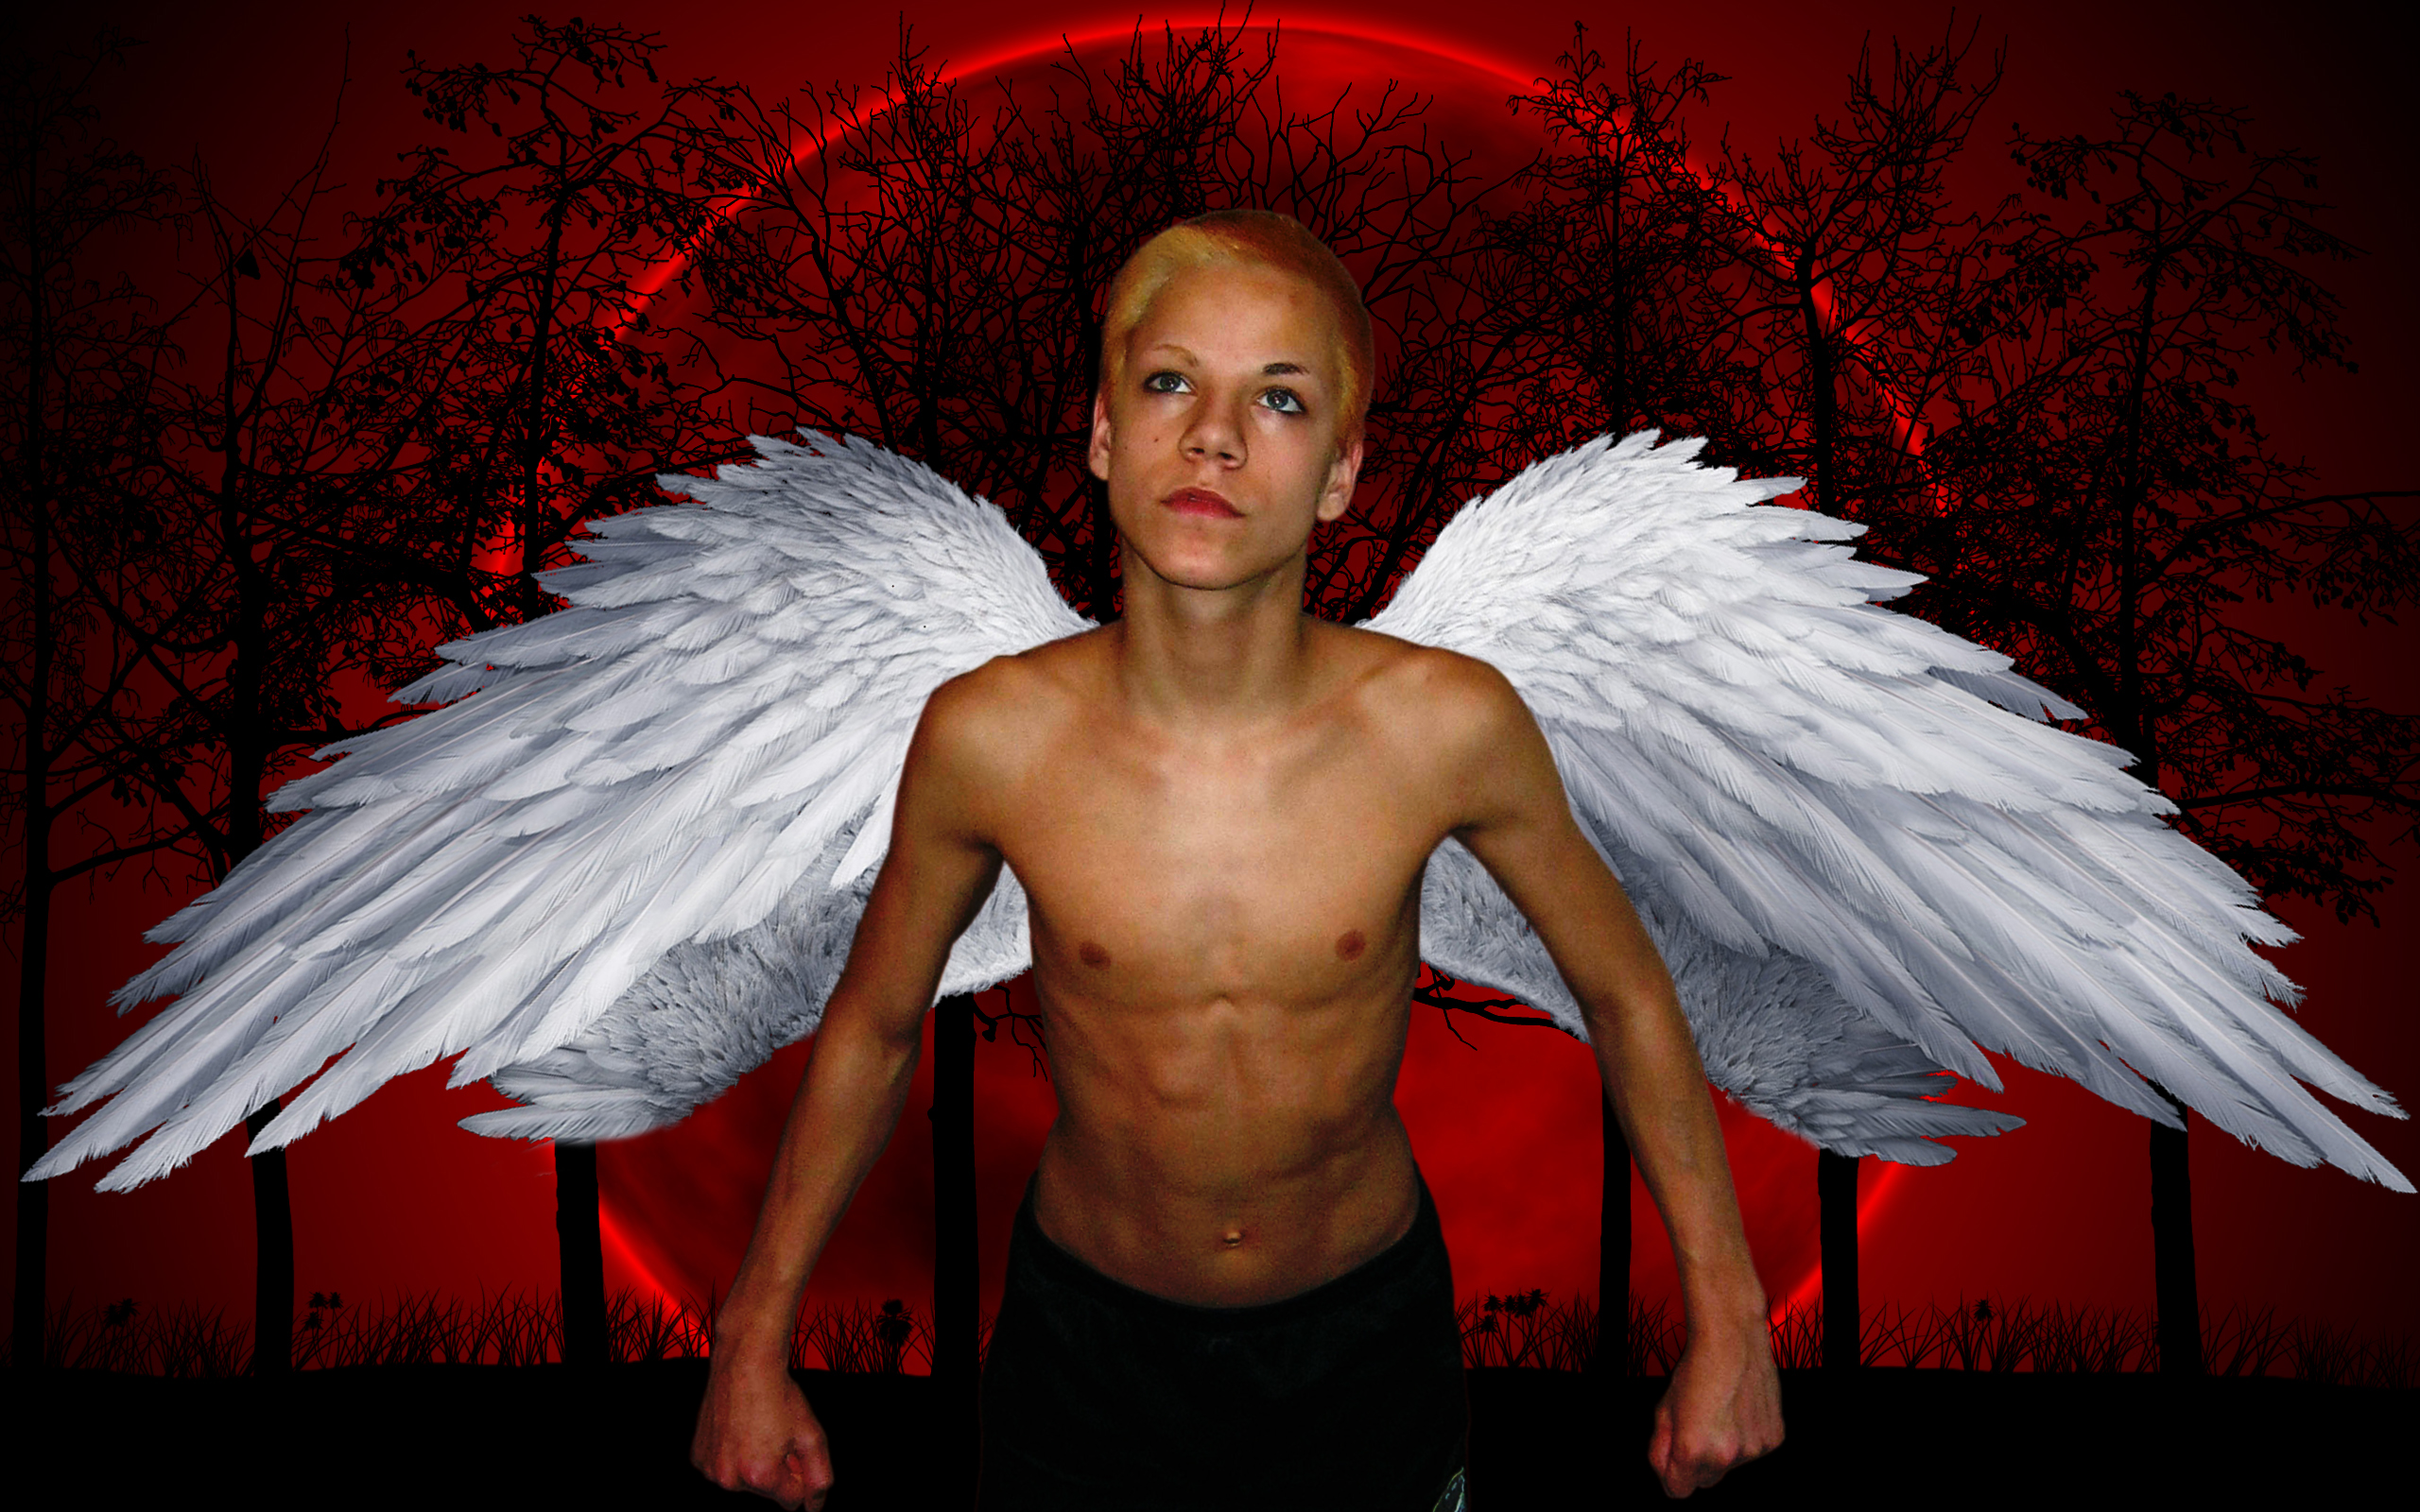 Alpha coders wallpaper abyss fantasy angel 115145